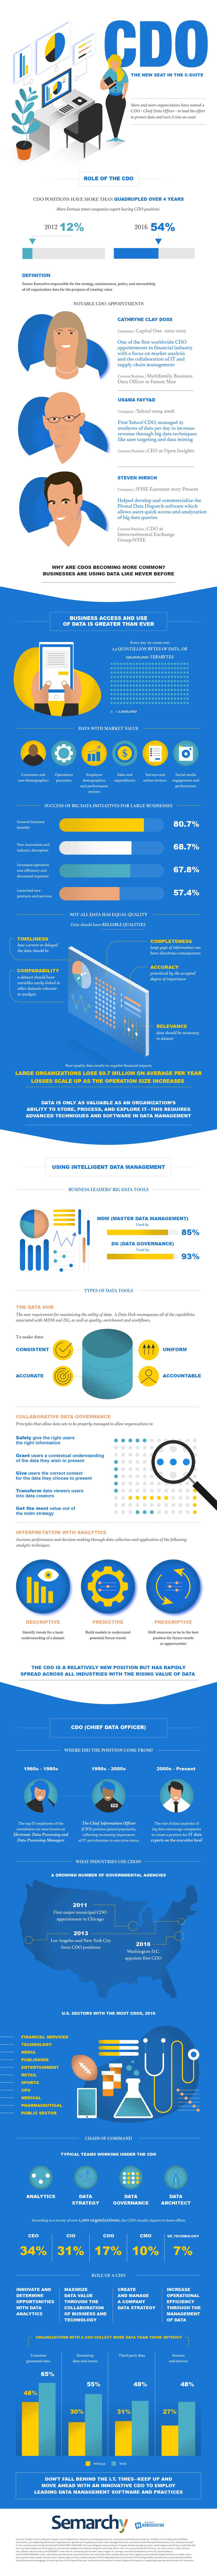 Semarchy CDO Infographic.jpg